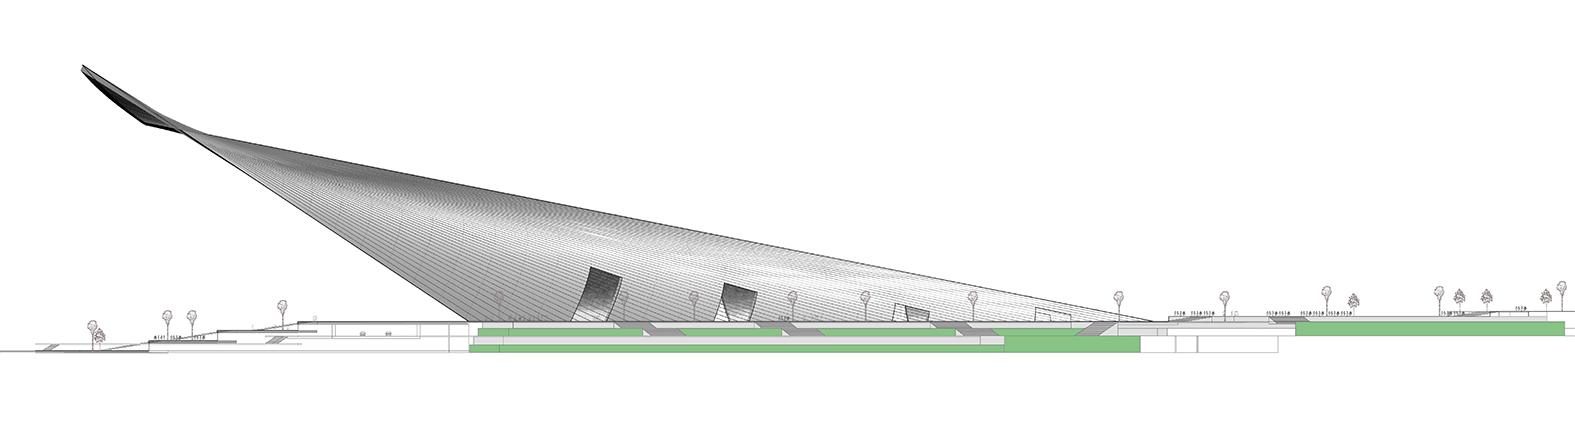 SPANS associates - Nicolas Sterling - Elke Sterling Presser - The Iconic Mosque - Dubai - Creek Harbour - Architect Engineer - concept 01, ns_spans